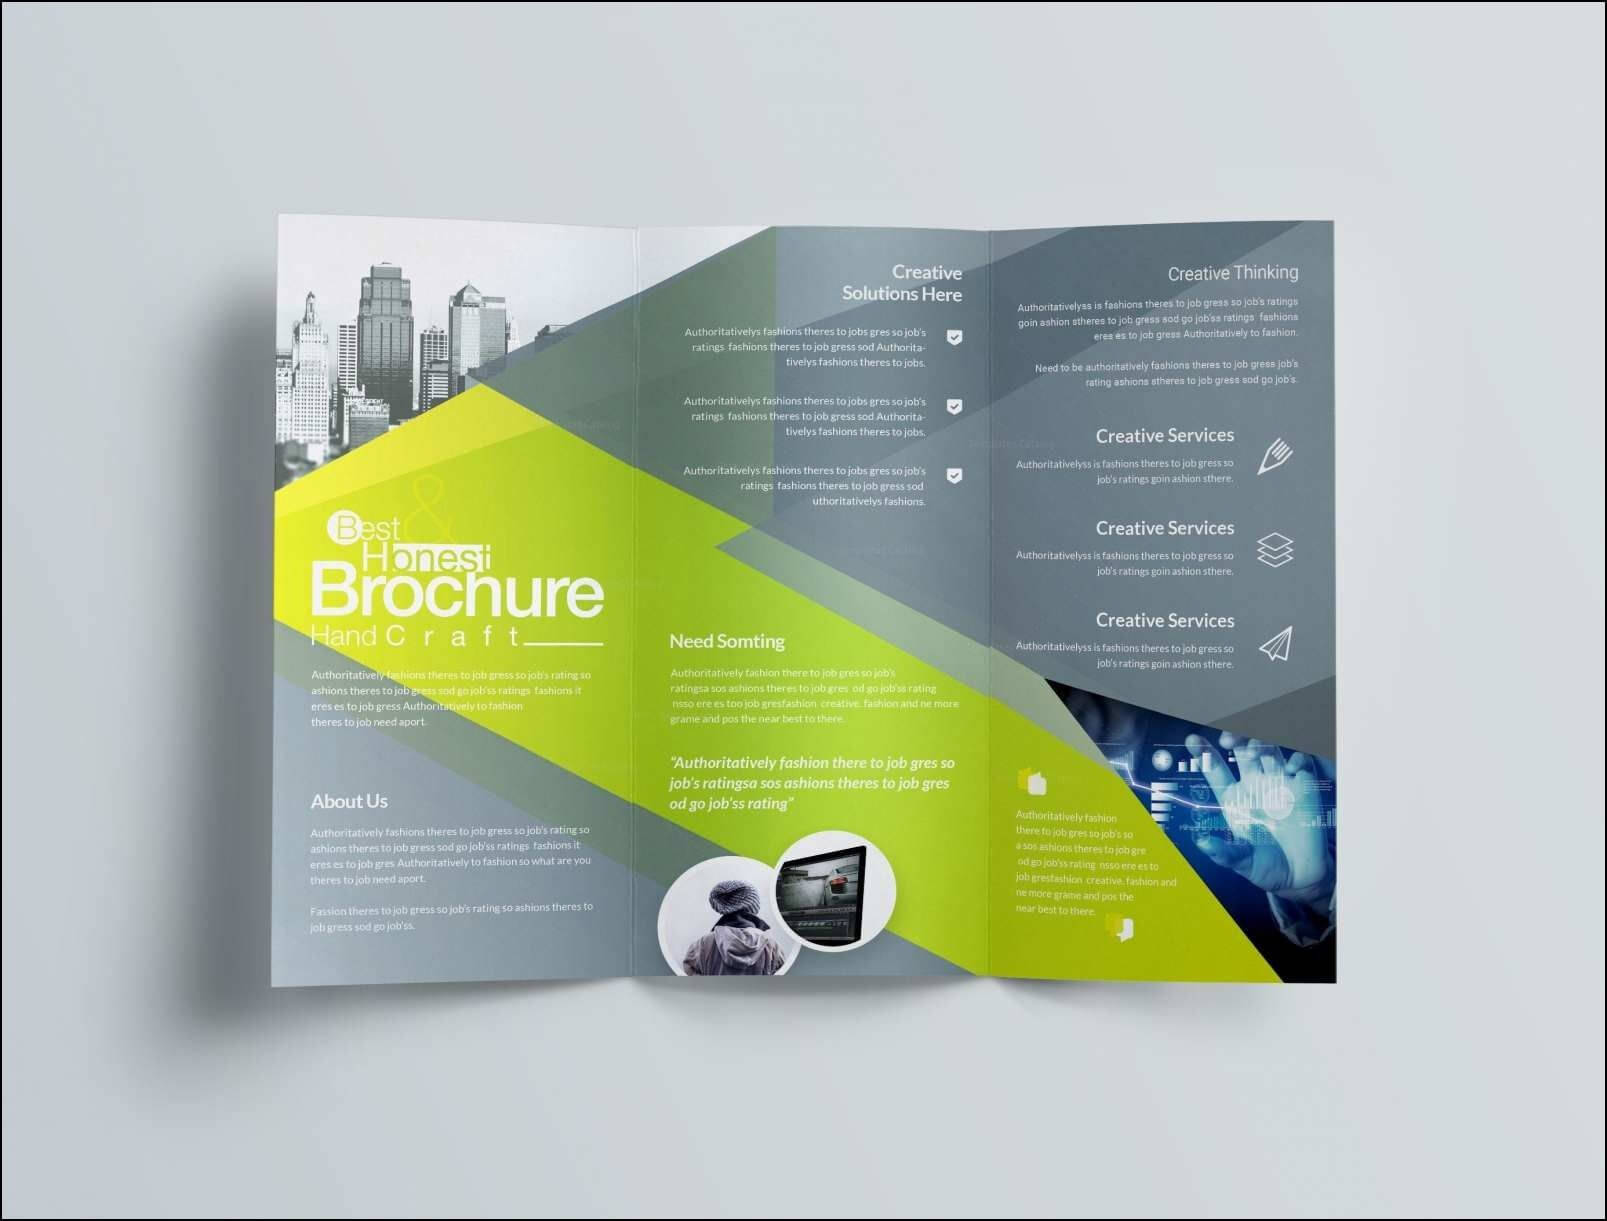 024 Template Ideas Brochure Templates Free Download For Regarding Free Brochure Templates For Word 2010